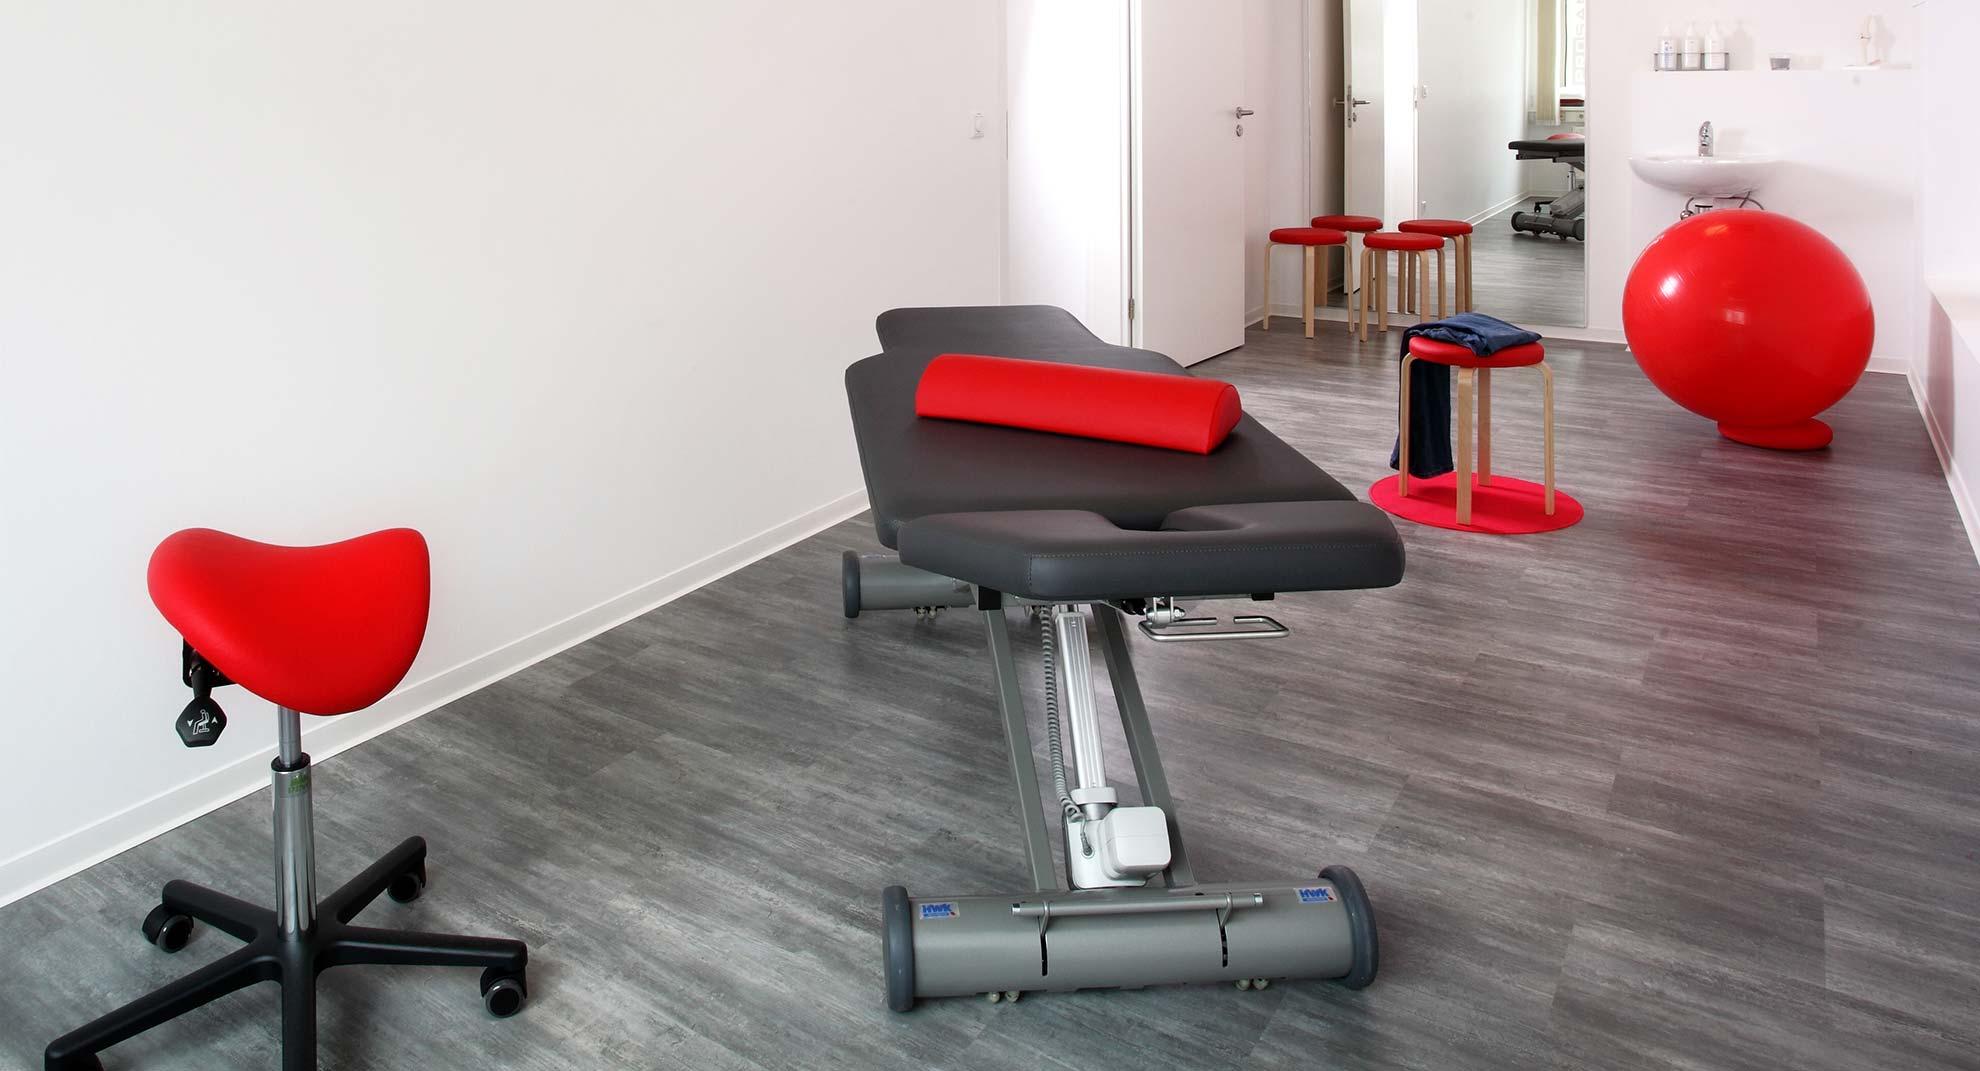 Küchen discount greifswald  Physiotherapie Prosanum - Stephanie Radtke Greifswald